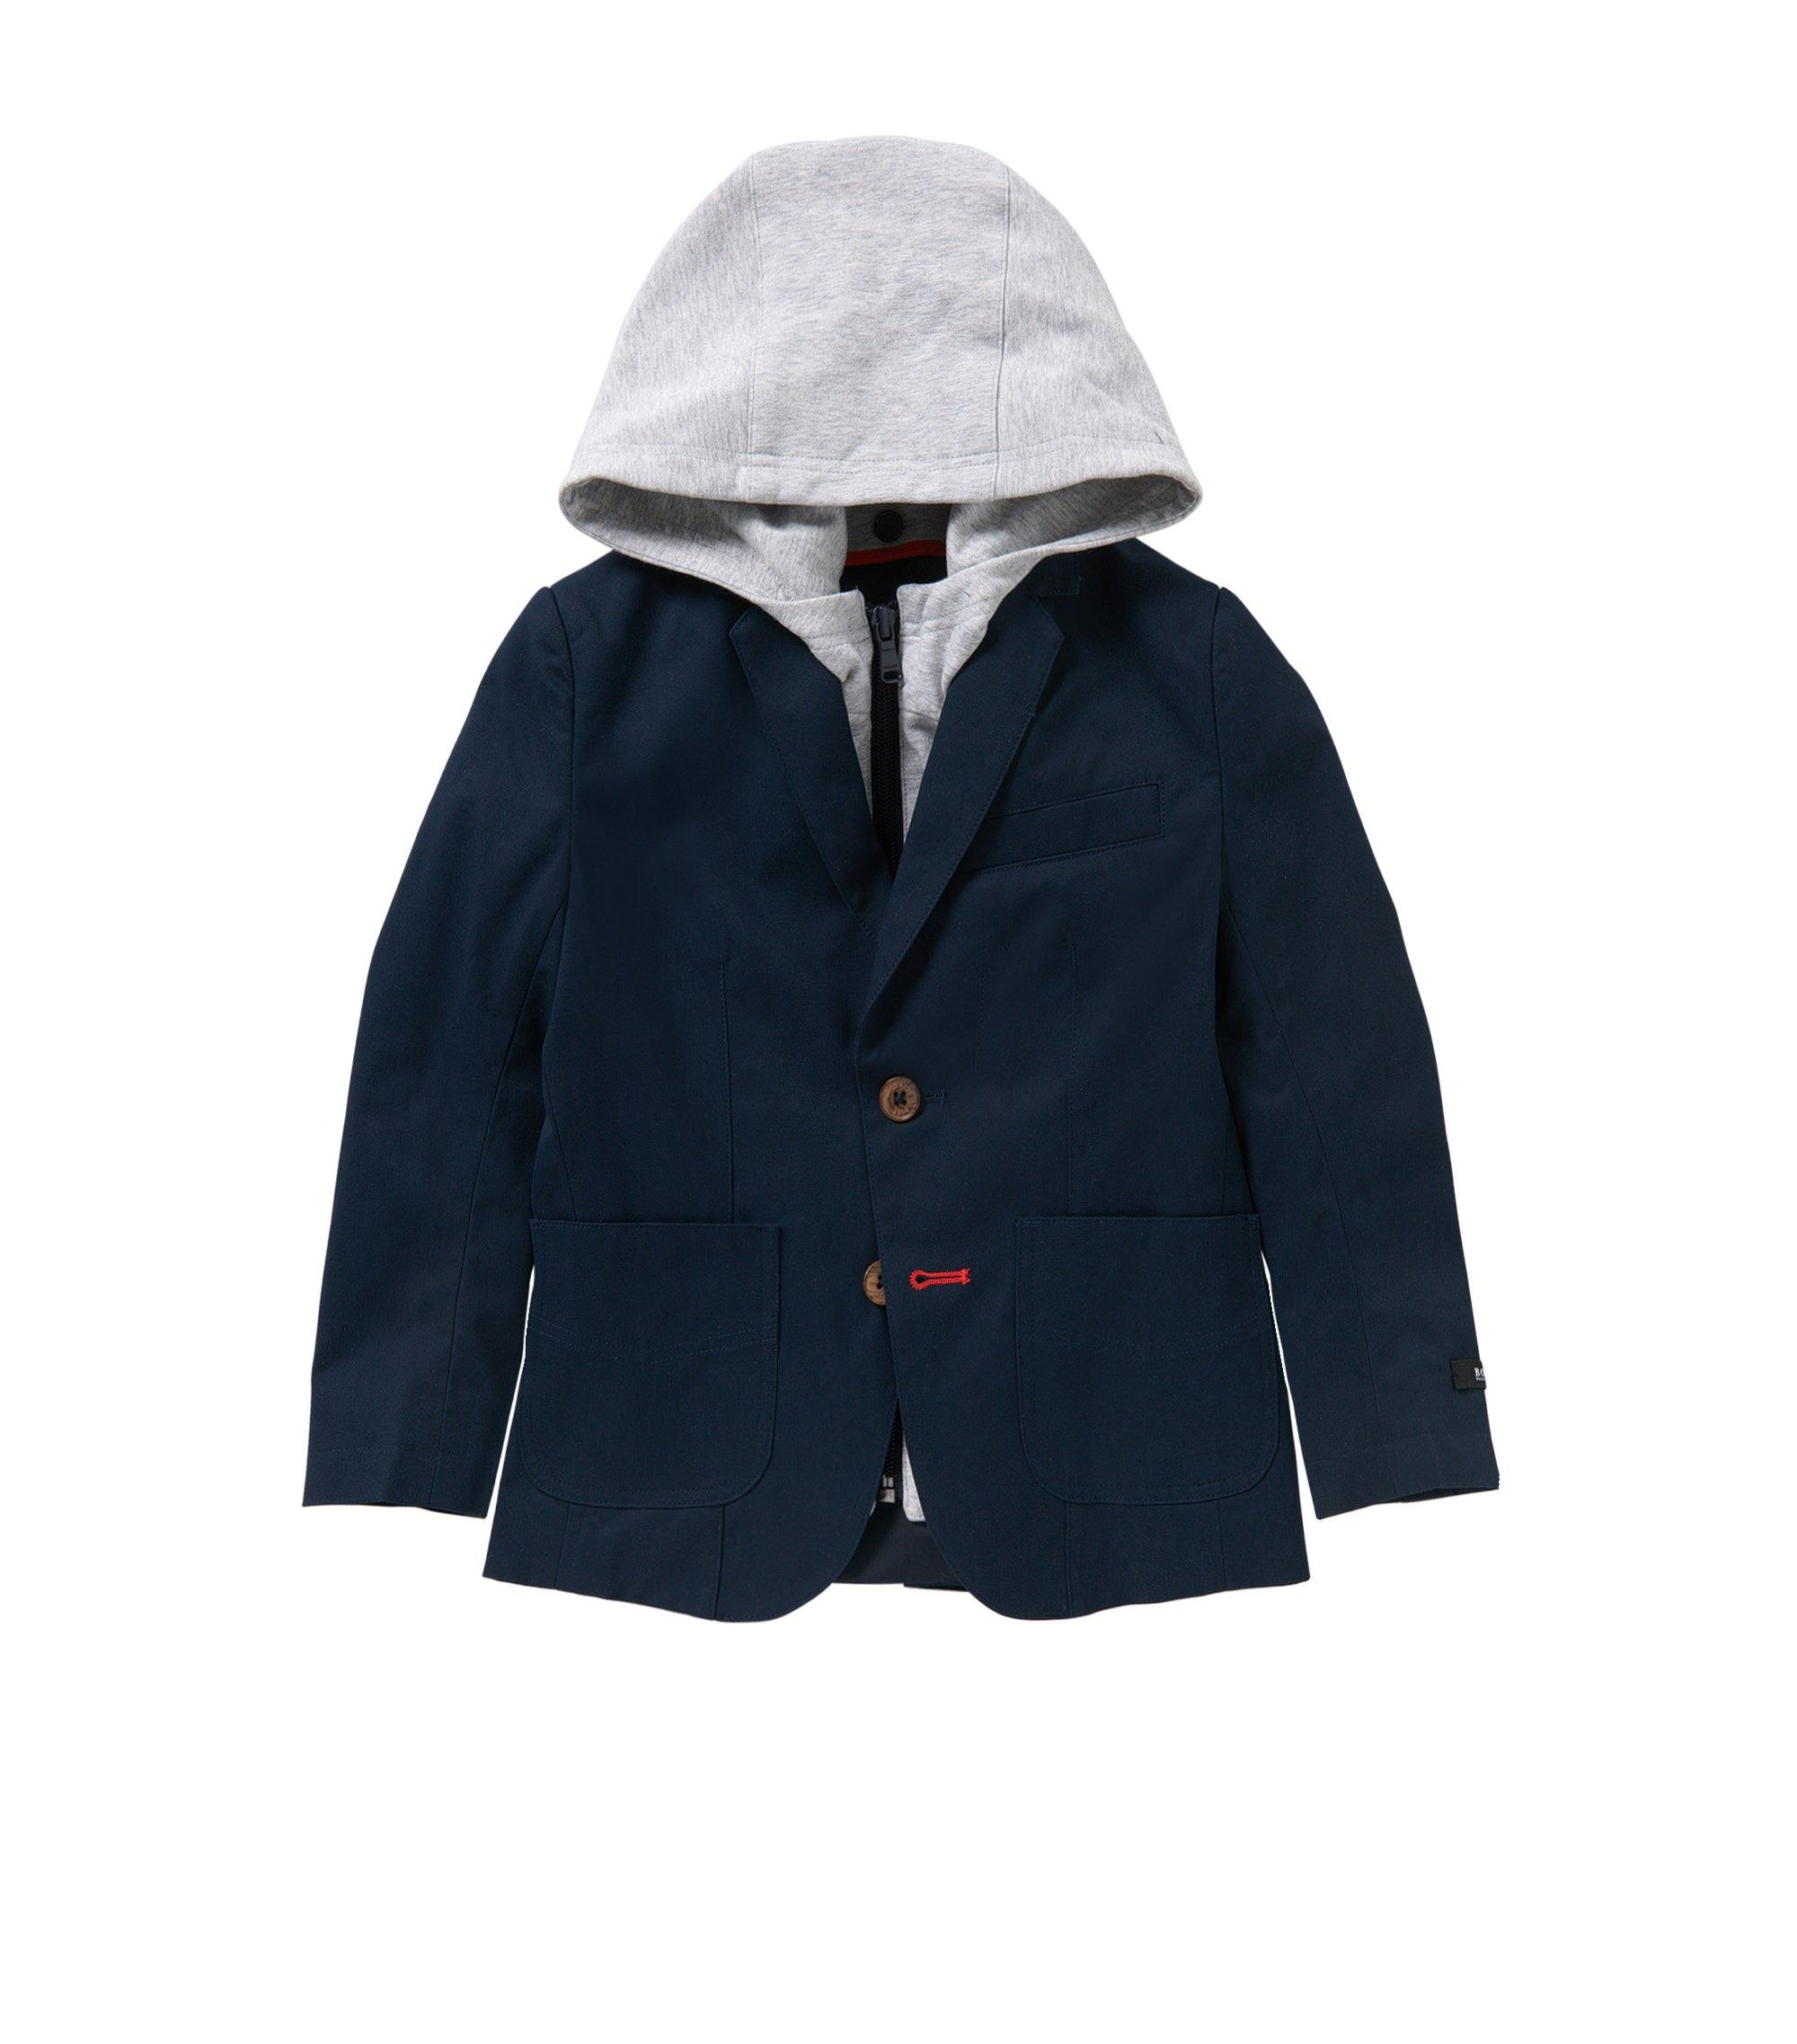 'J26276' | Boys Suit Jacket, Removable Hood, Dark Blue